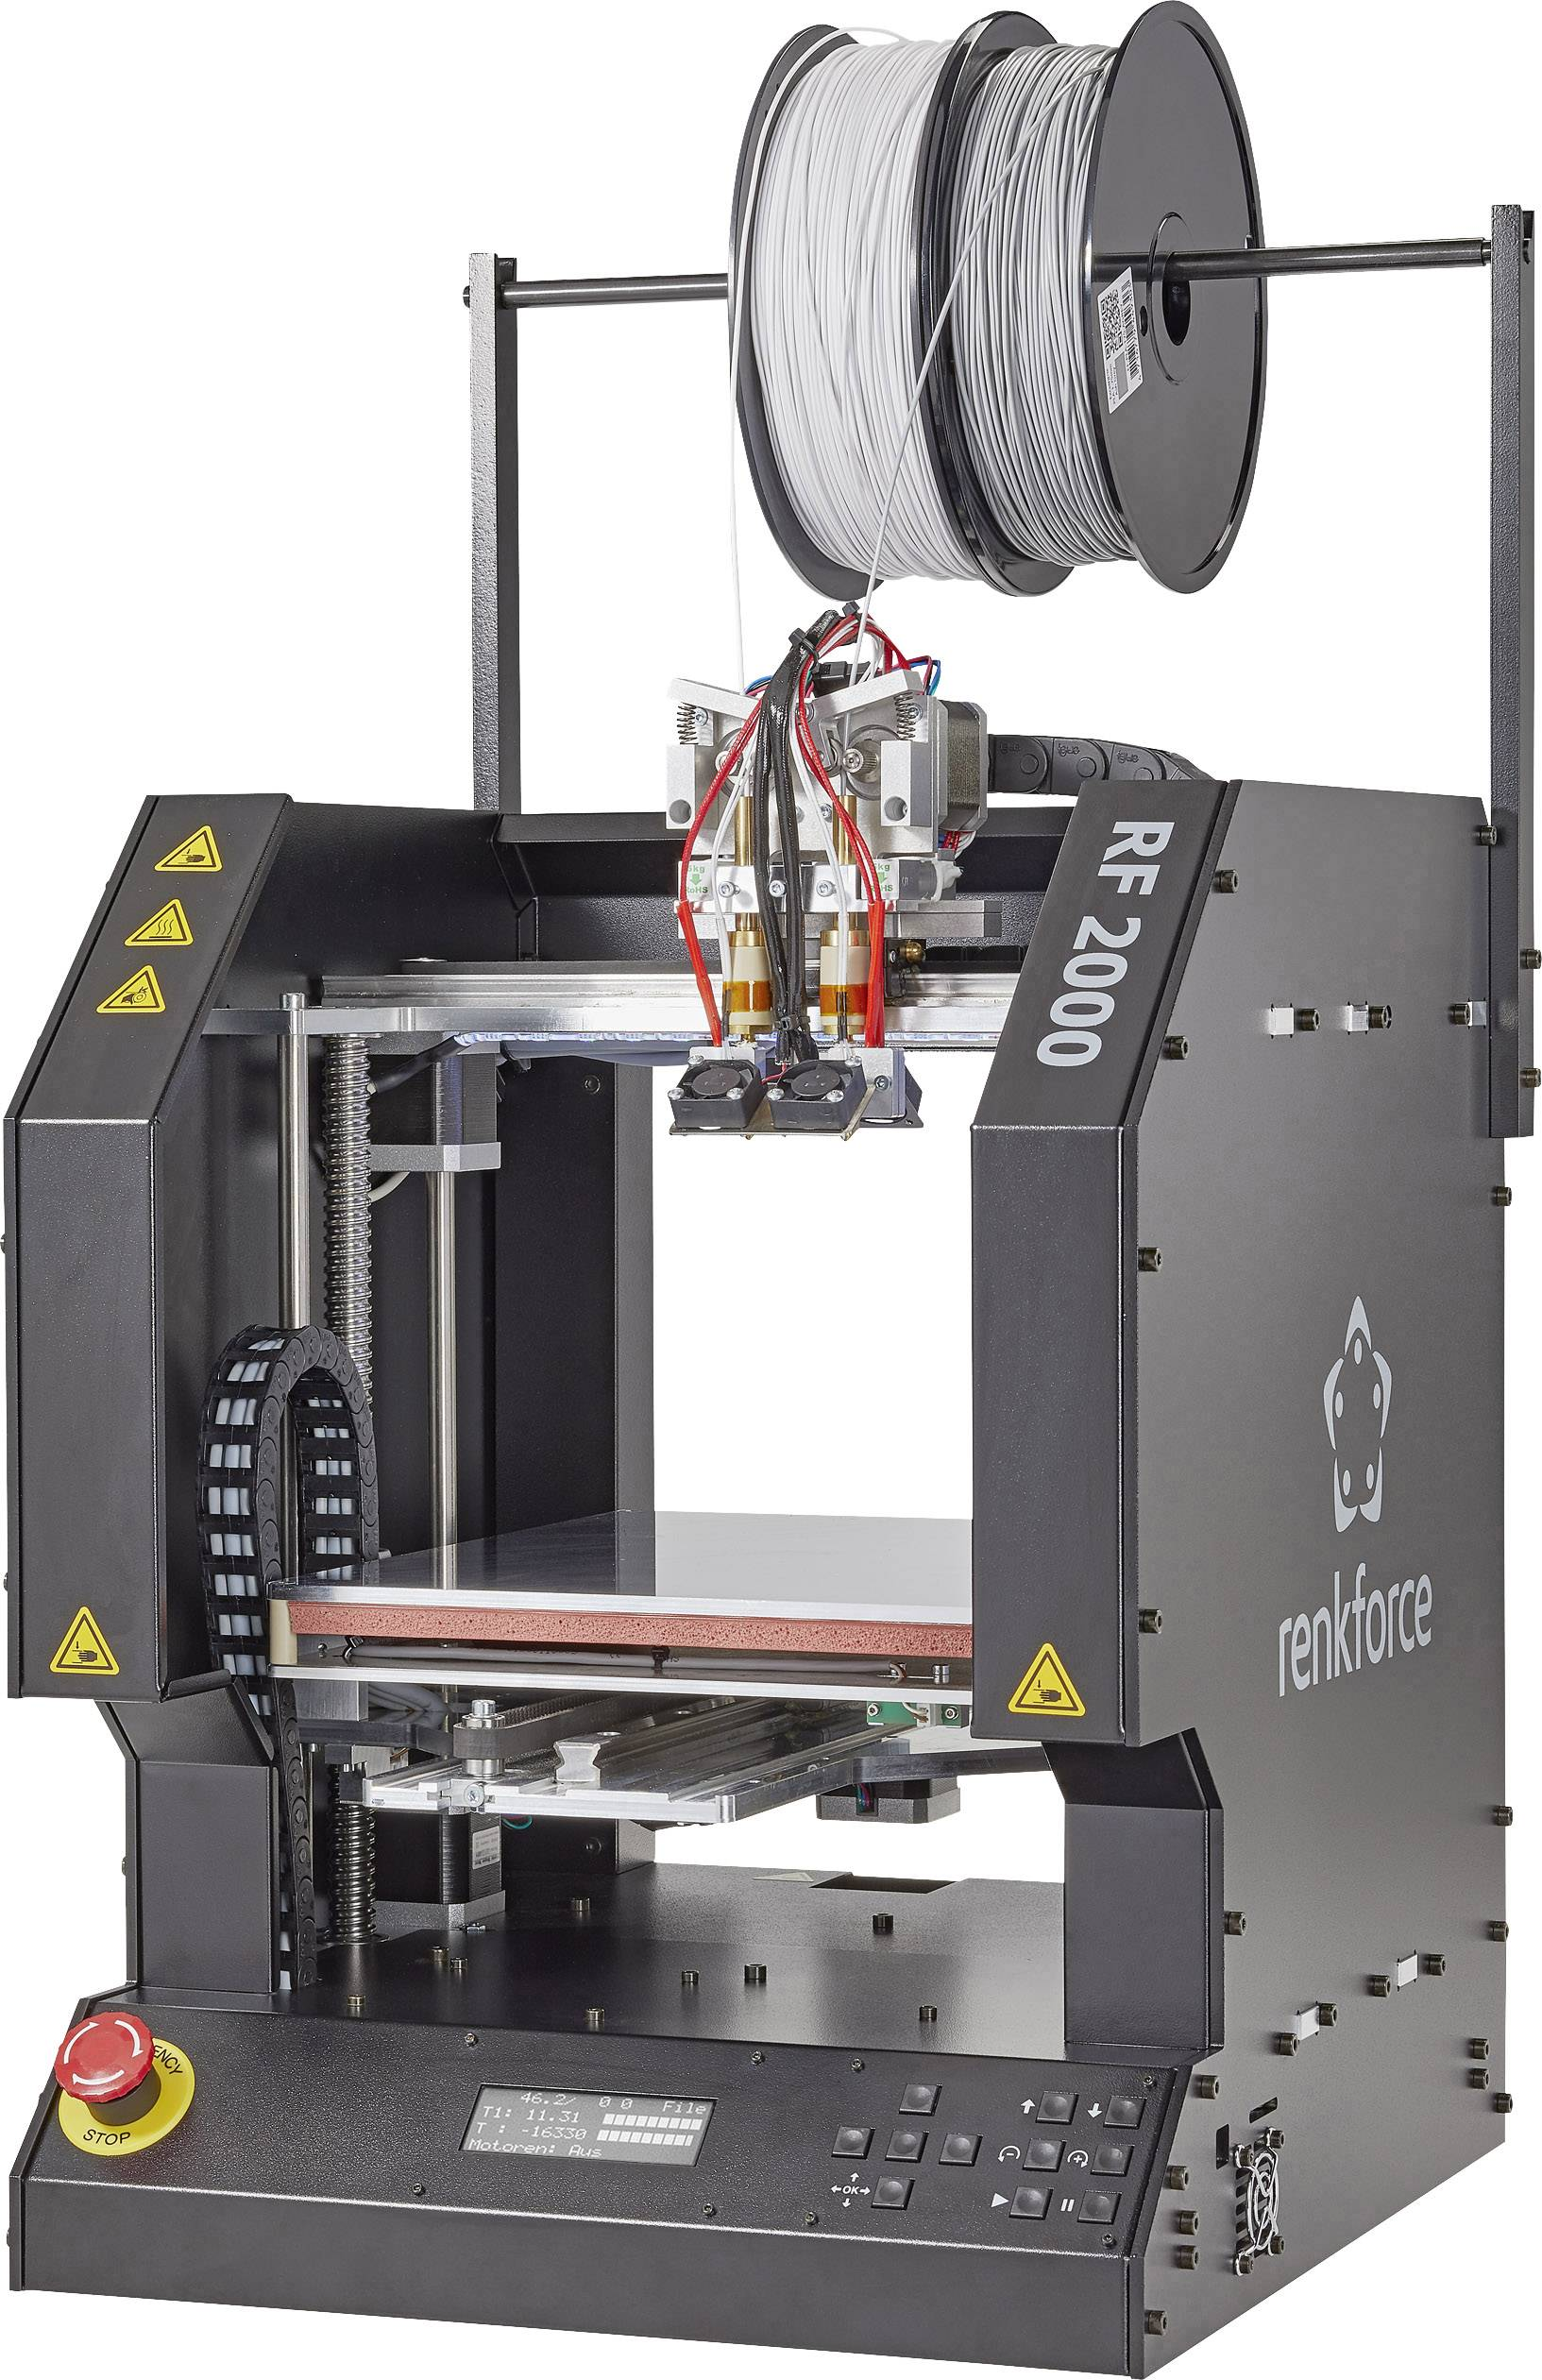 3D tiskárna Renkforce RF2000v2 FGD, zdokonalená verze, 2 extrudéry